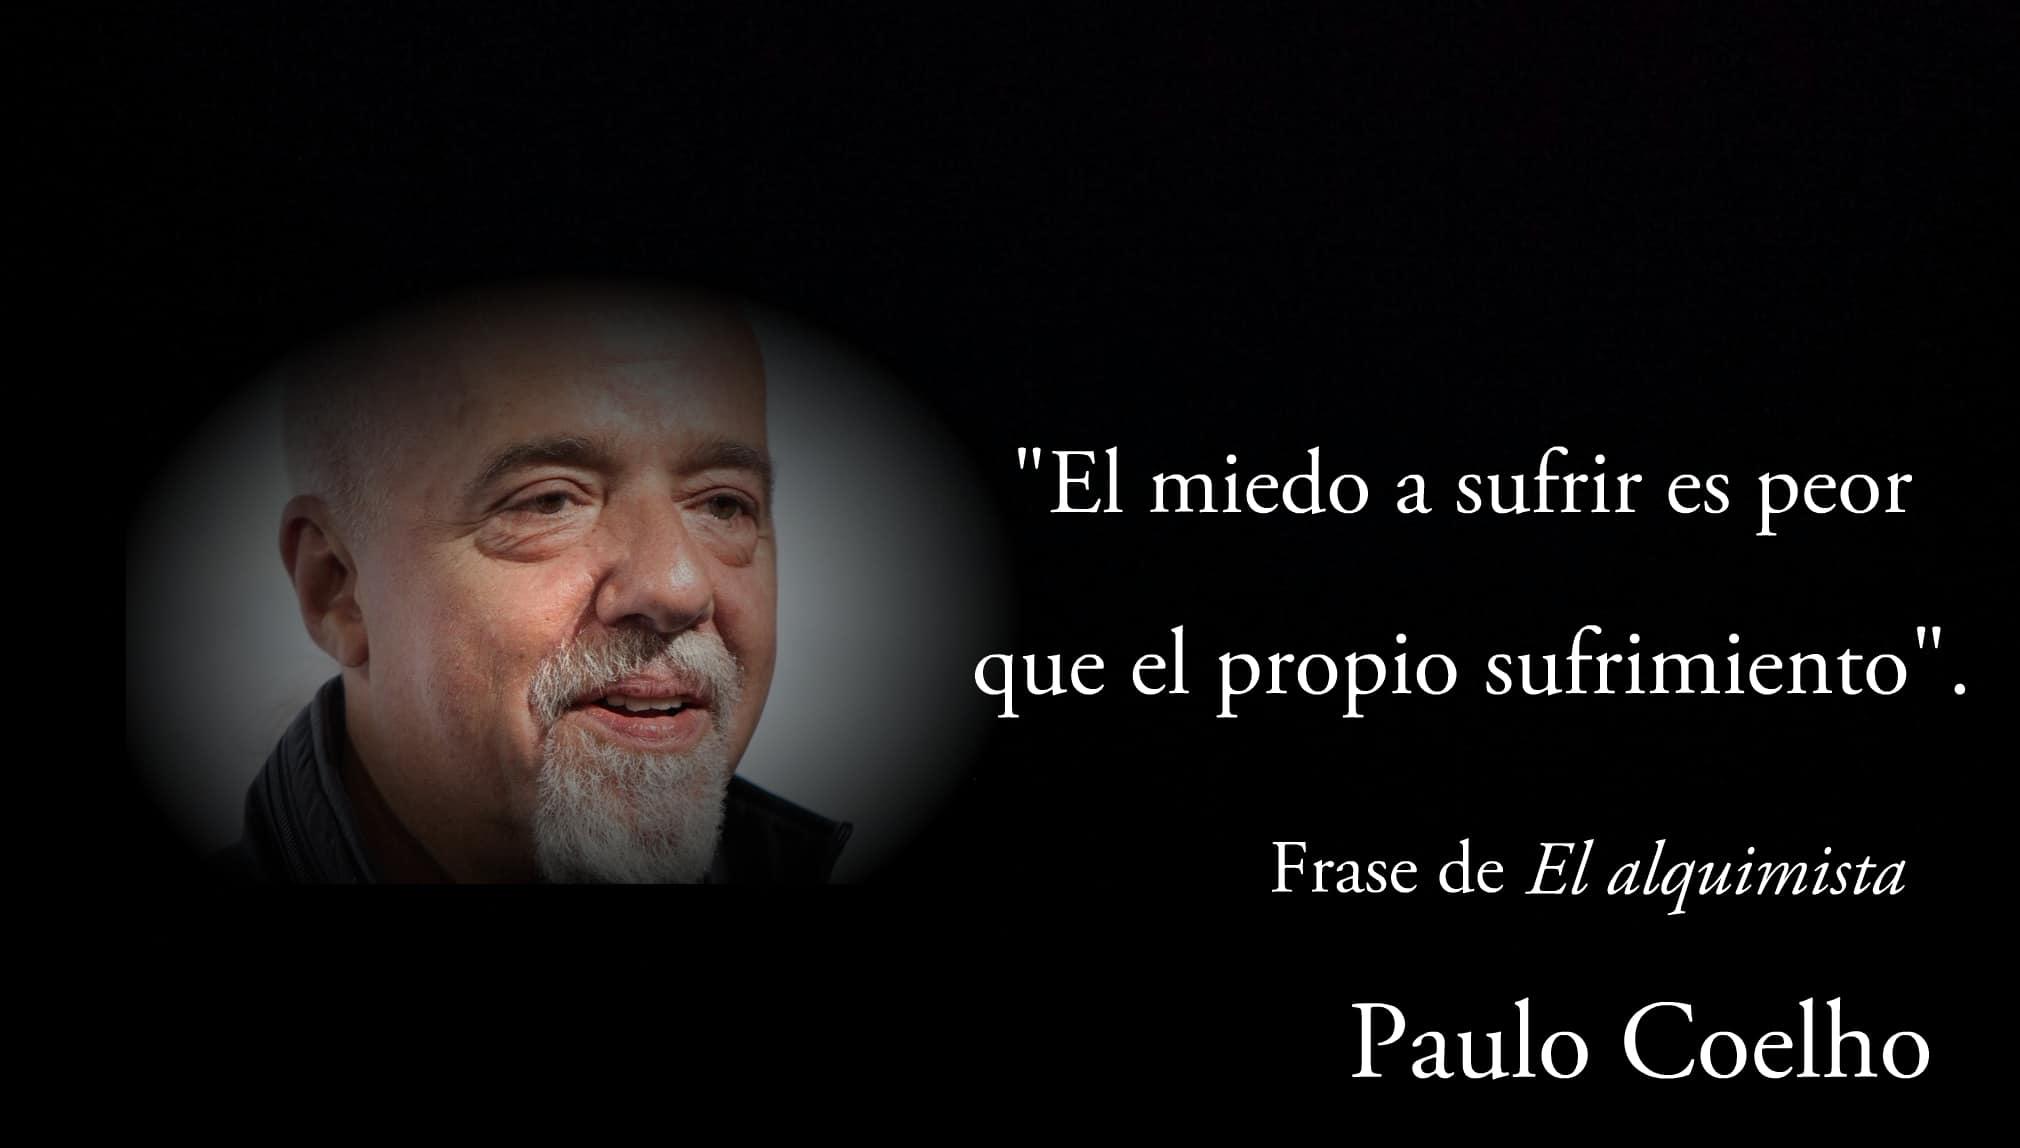 Frase de Paulo Coelho.